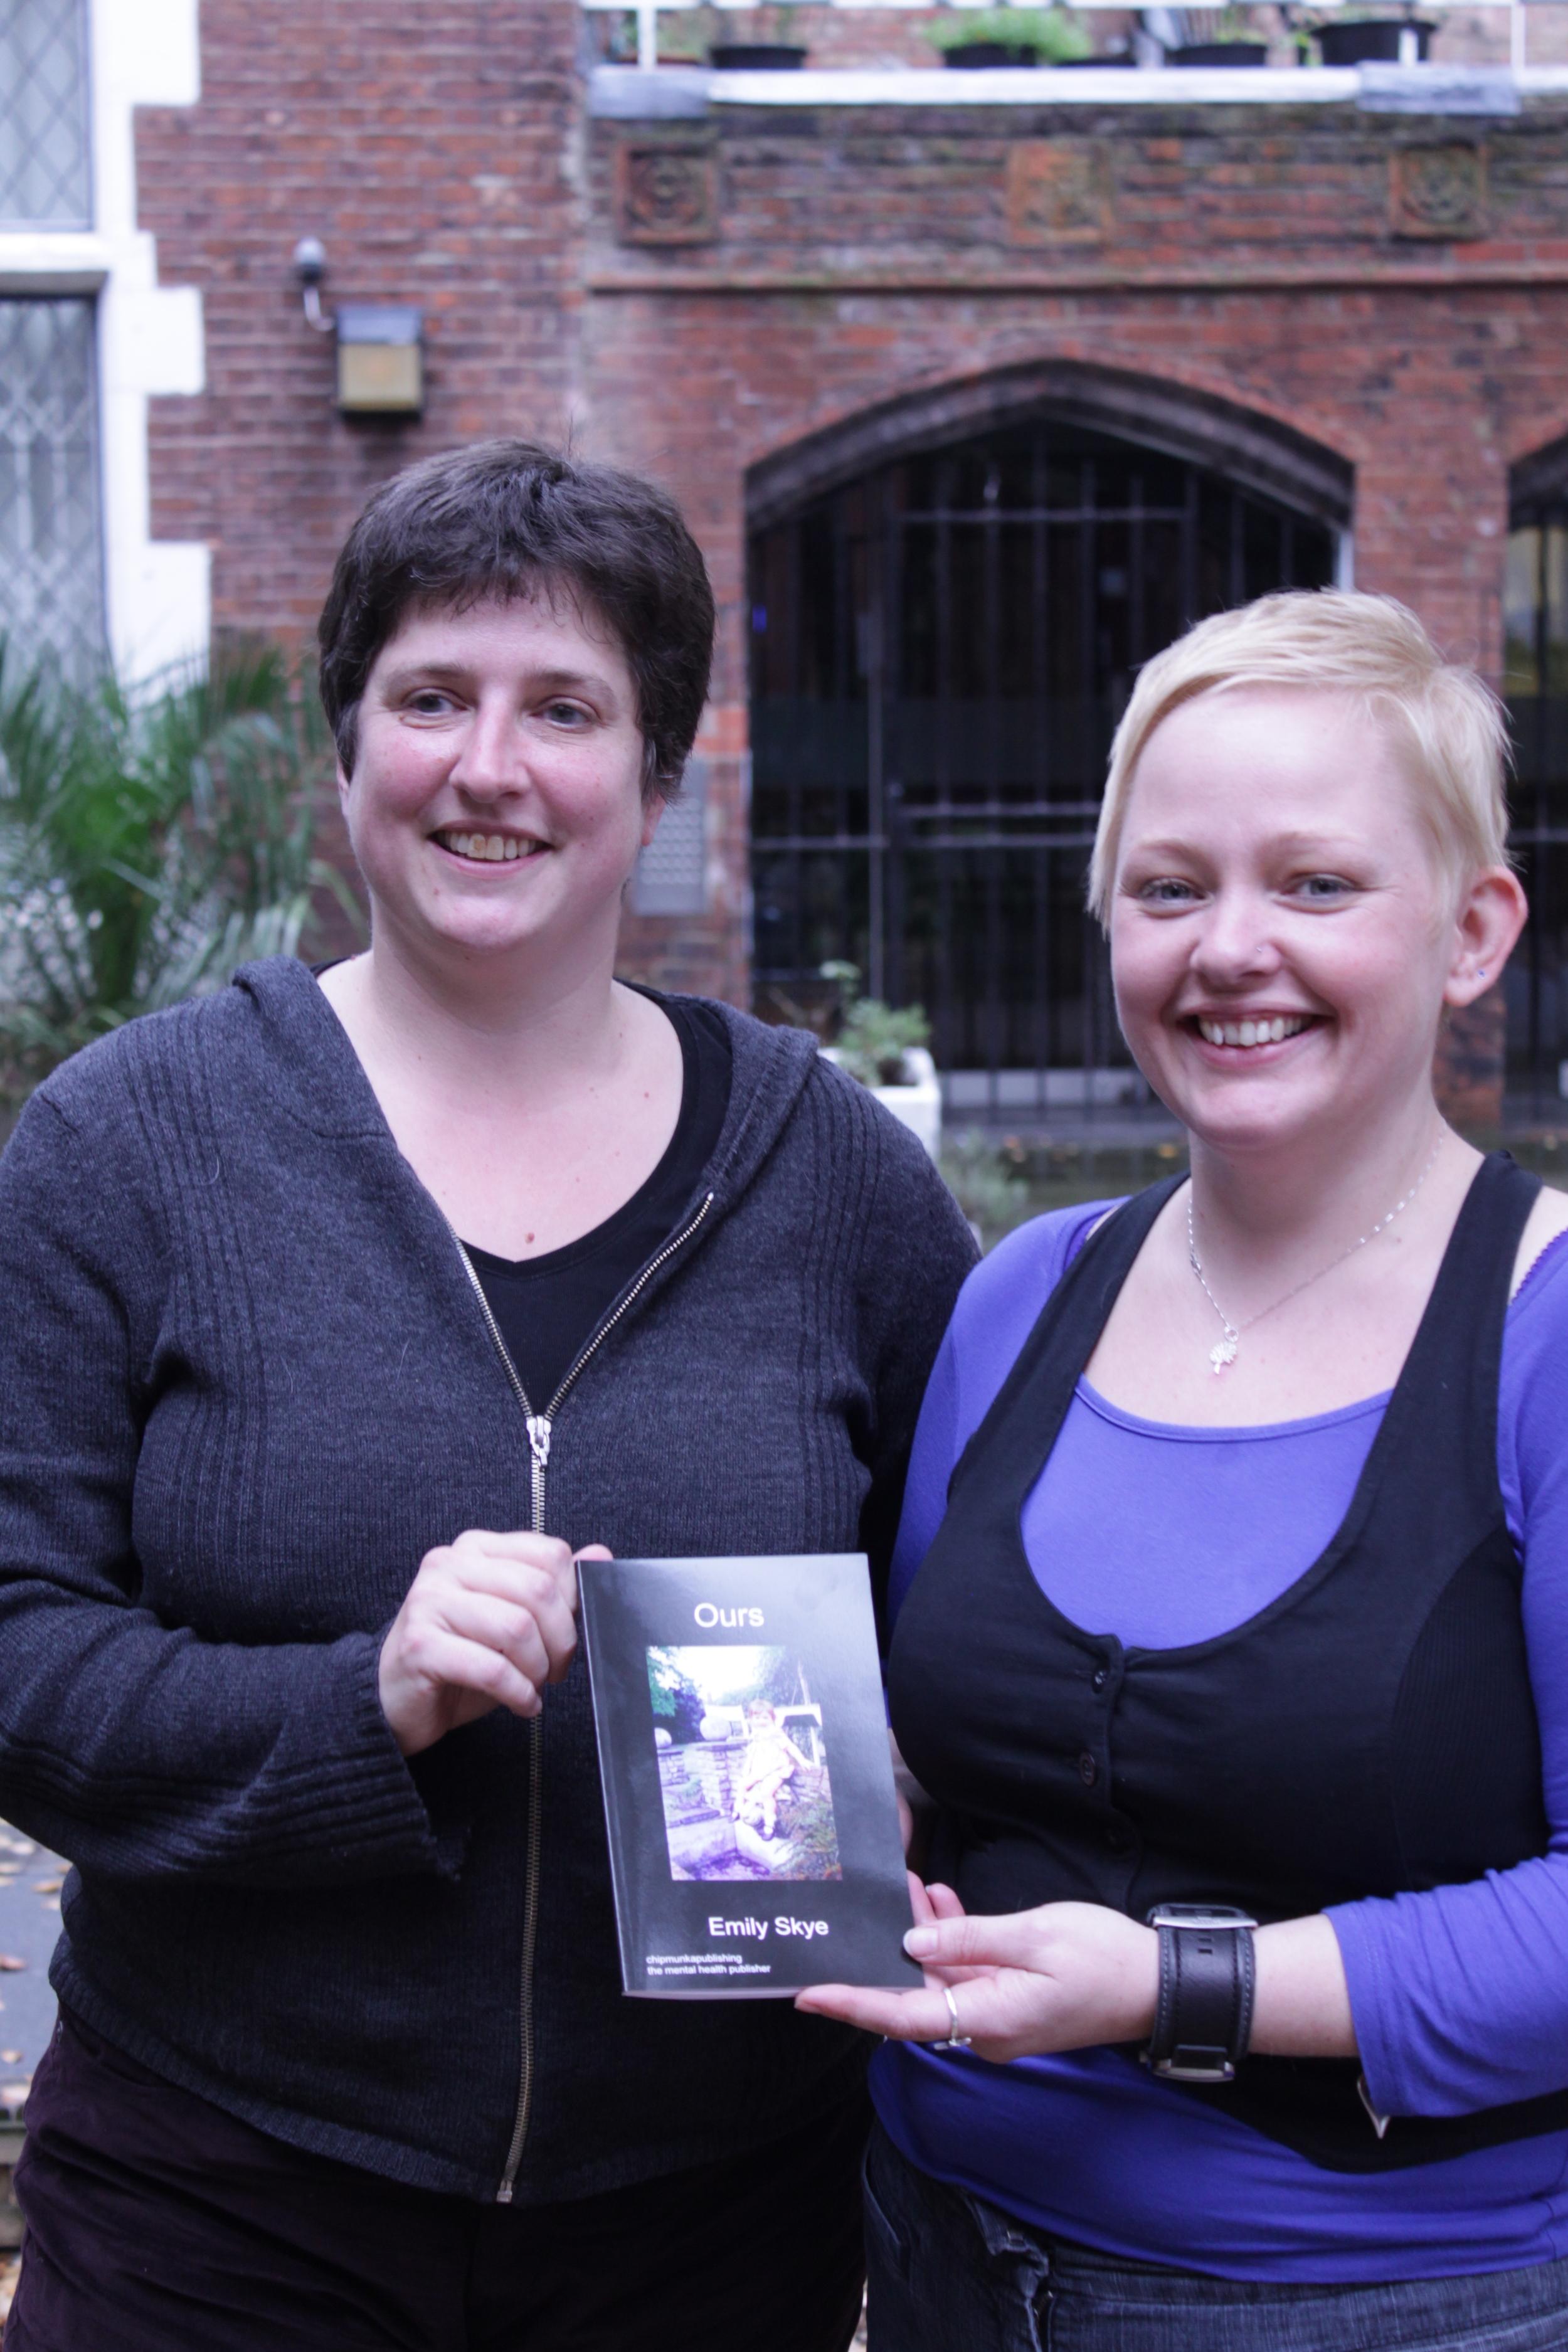 Emily Skye (left) and Kathyrn Morris-Roberts (right). Image Courtesy of the British Gestalt Journal.